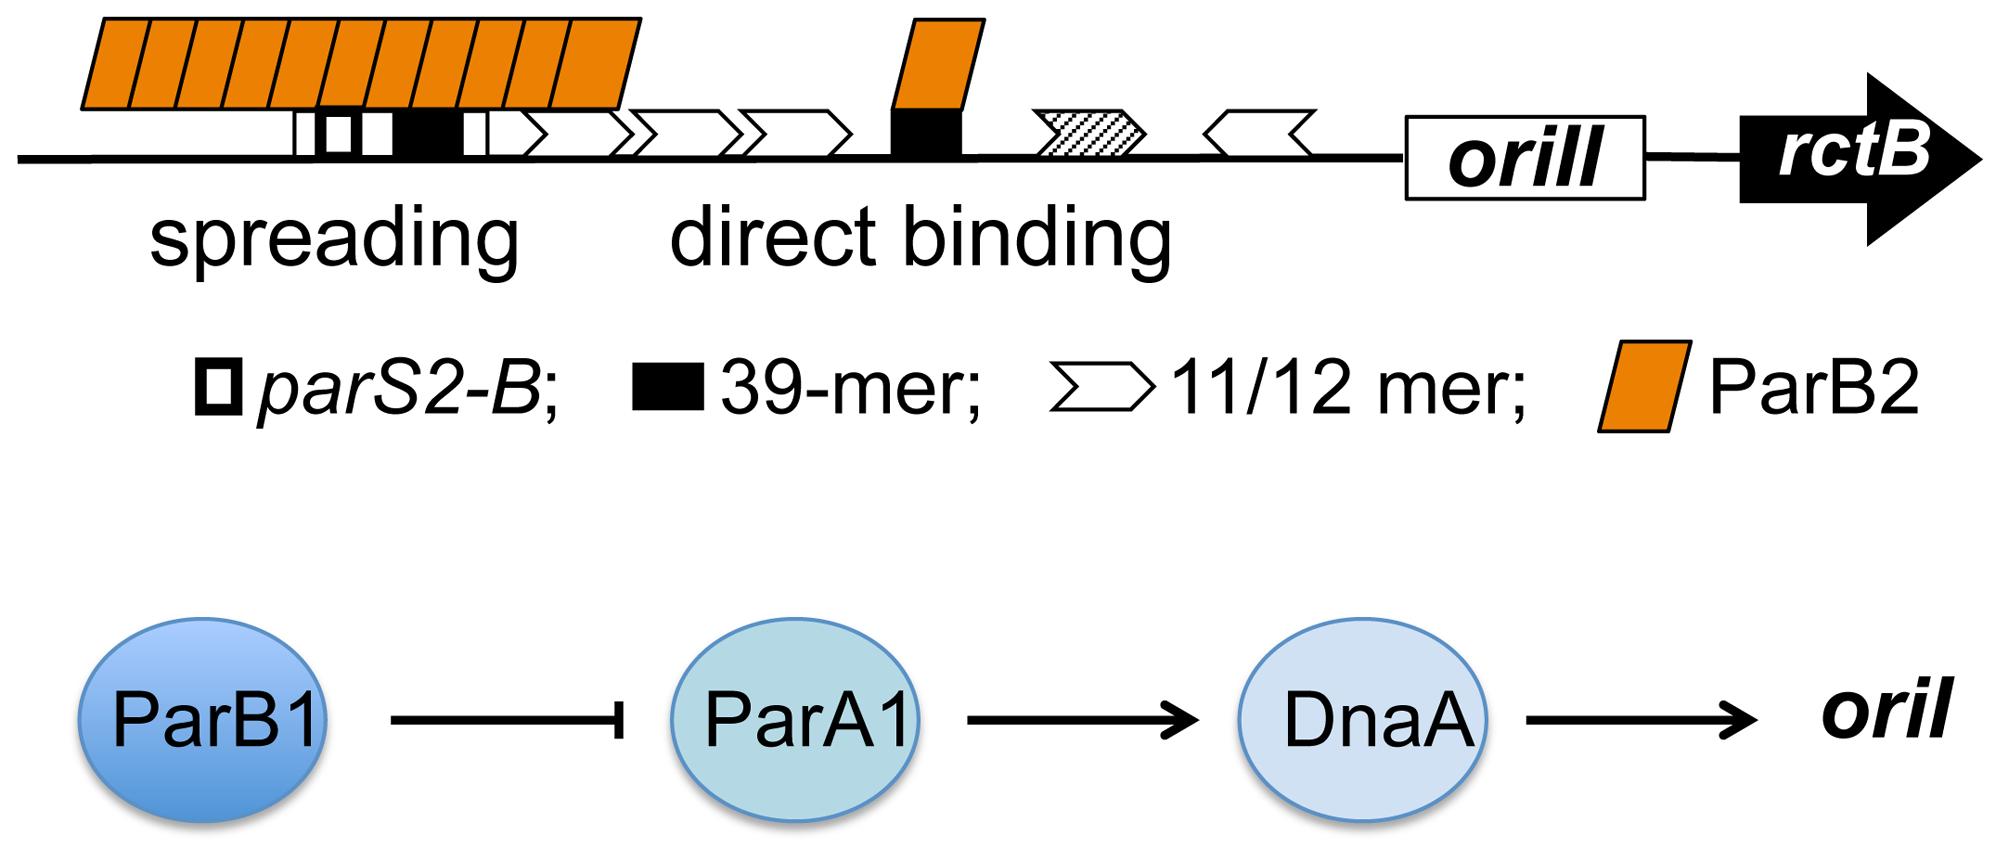 Model of activation of <i>V. cholerae</i> chromosome replication by Par proteins using multiple mechanisms.